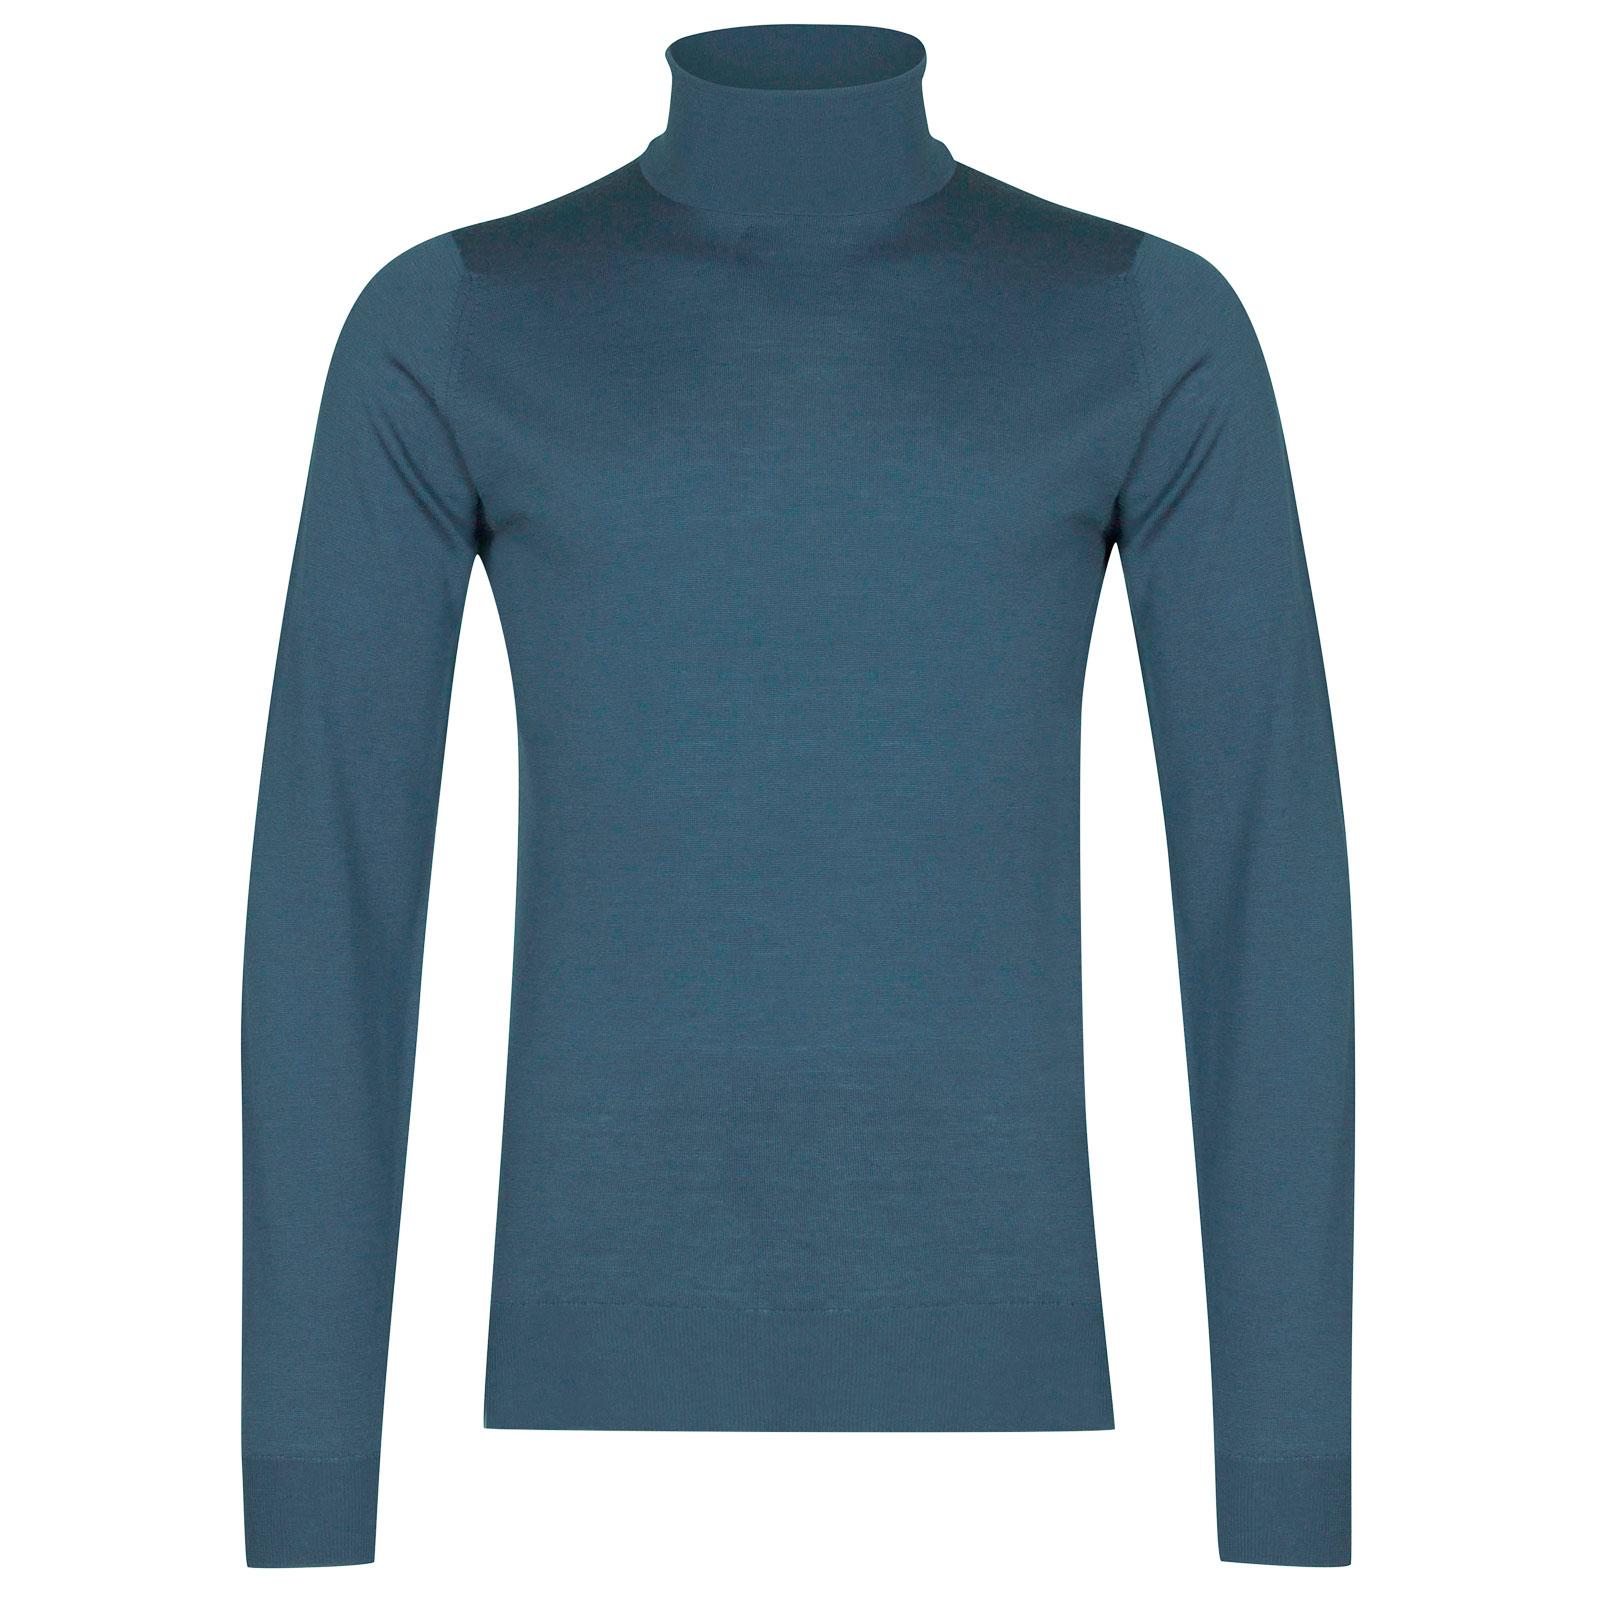 John Smedley Cherwell Merino Wool Pullover in Bias Blue-L